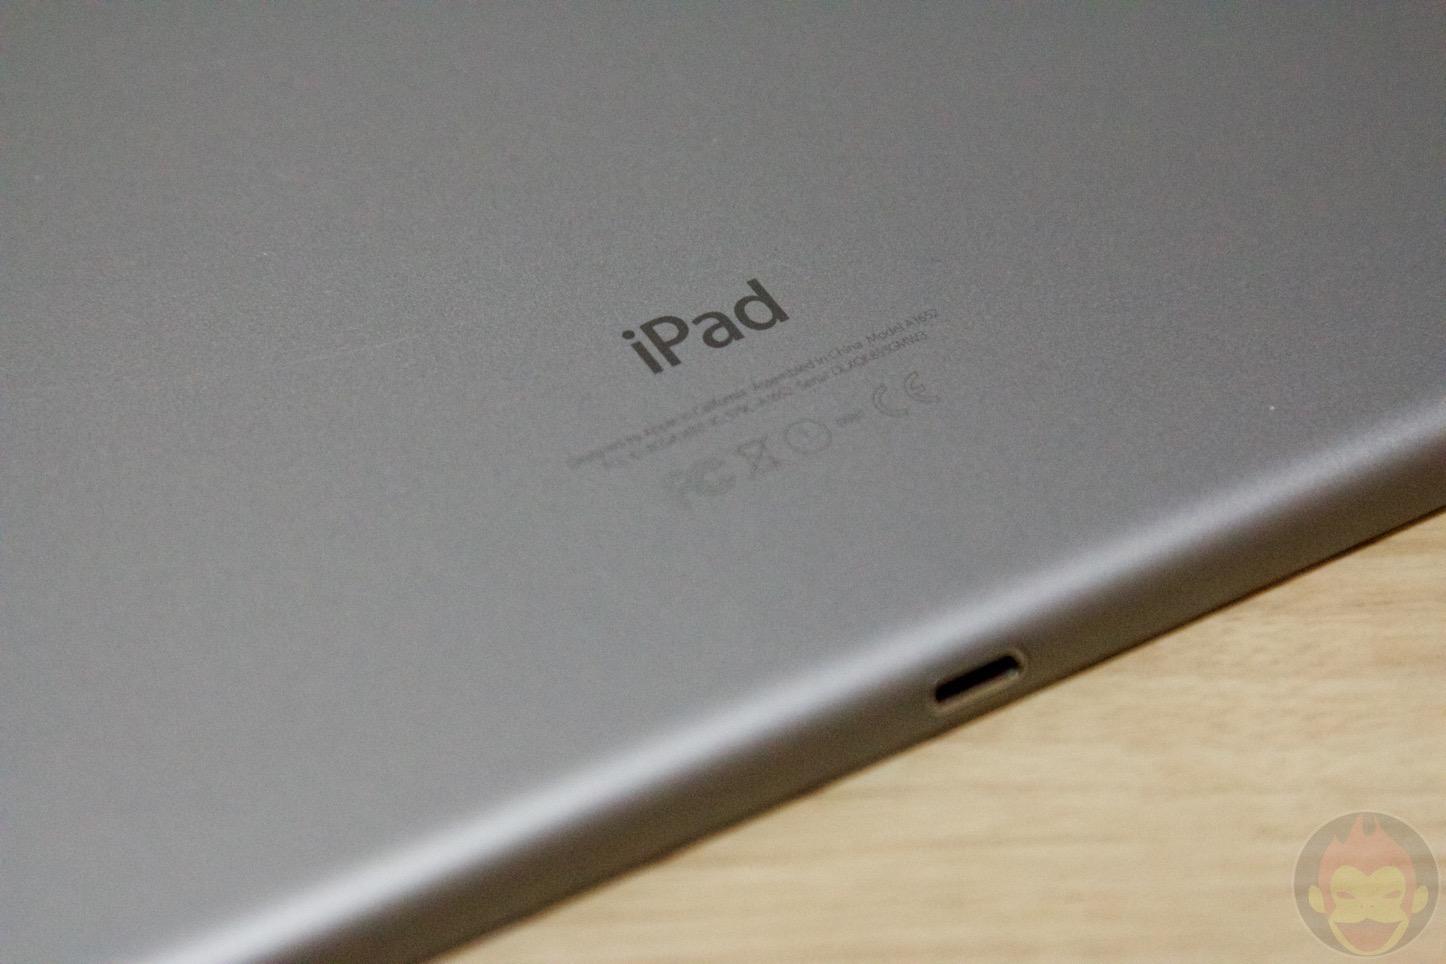 iPad-Pro-Unboxing-15.jpg